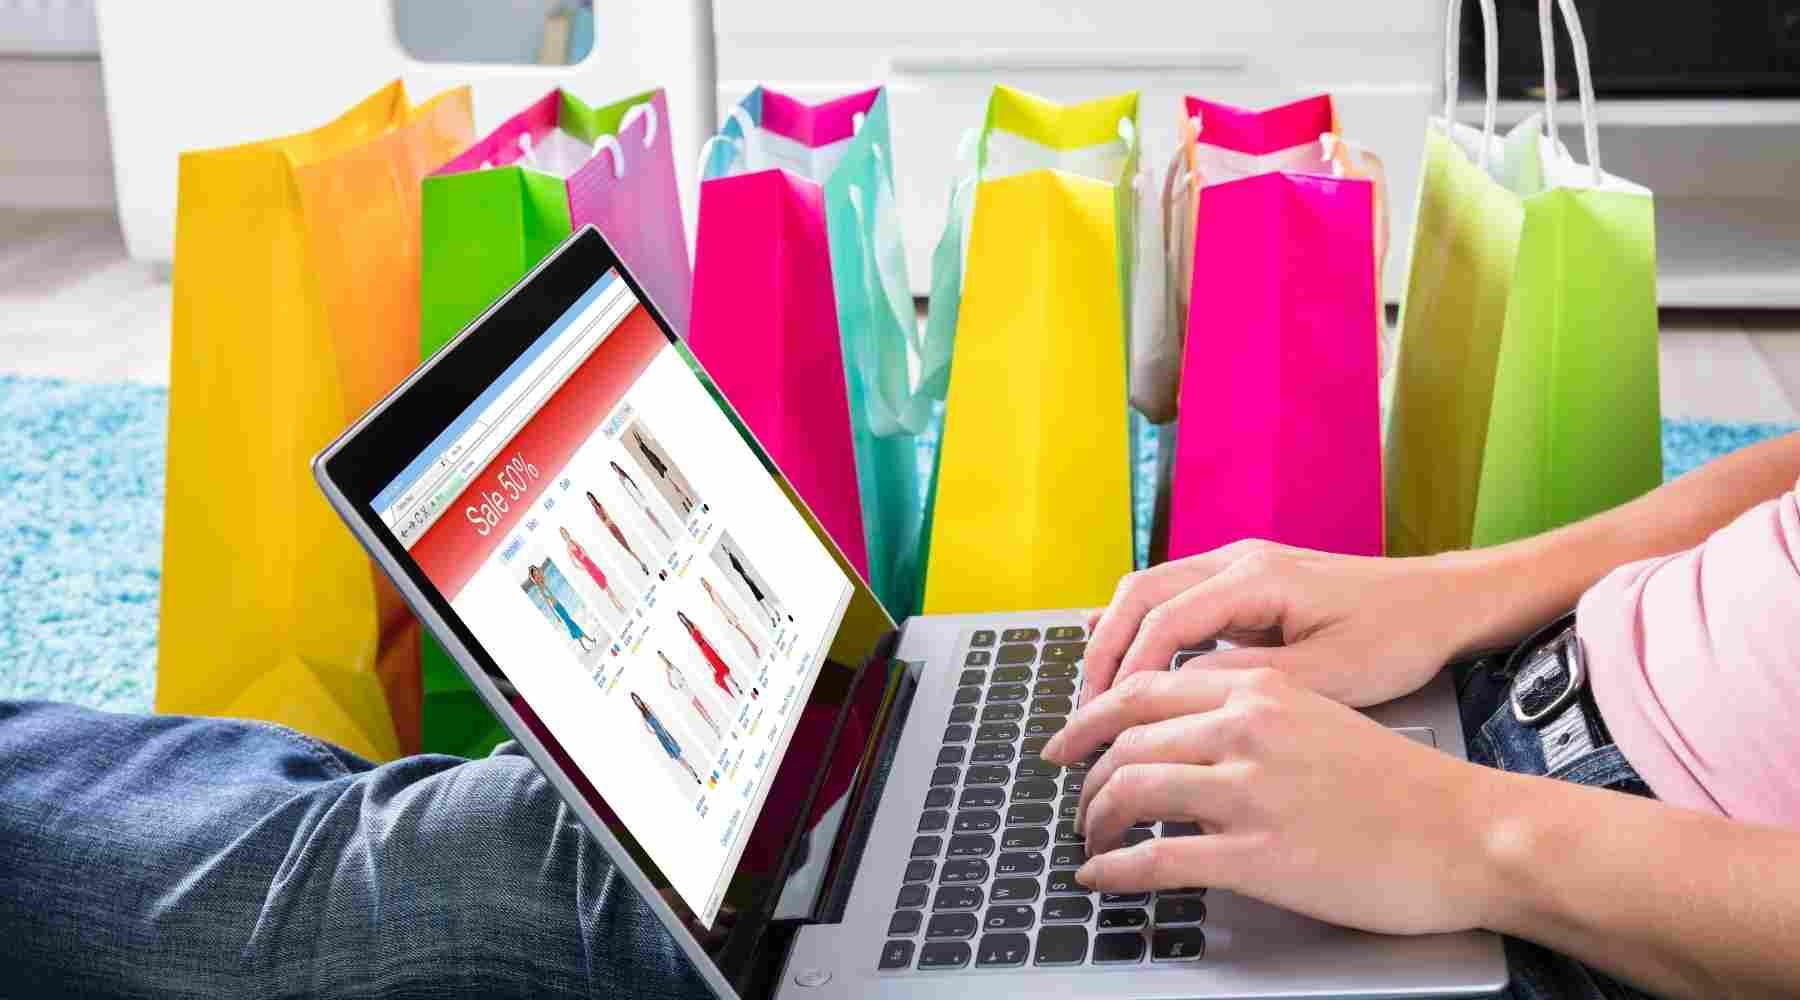 Hobbies that Make Money - Shopping